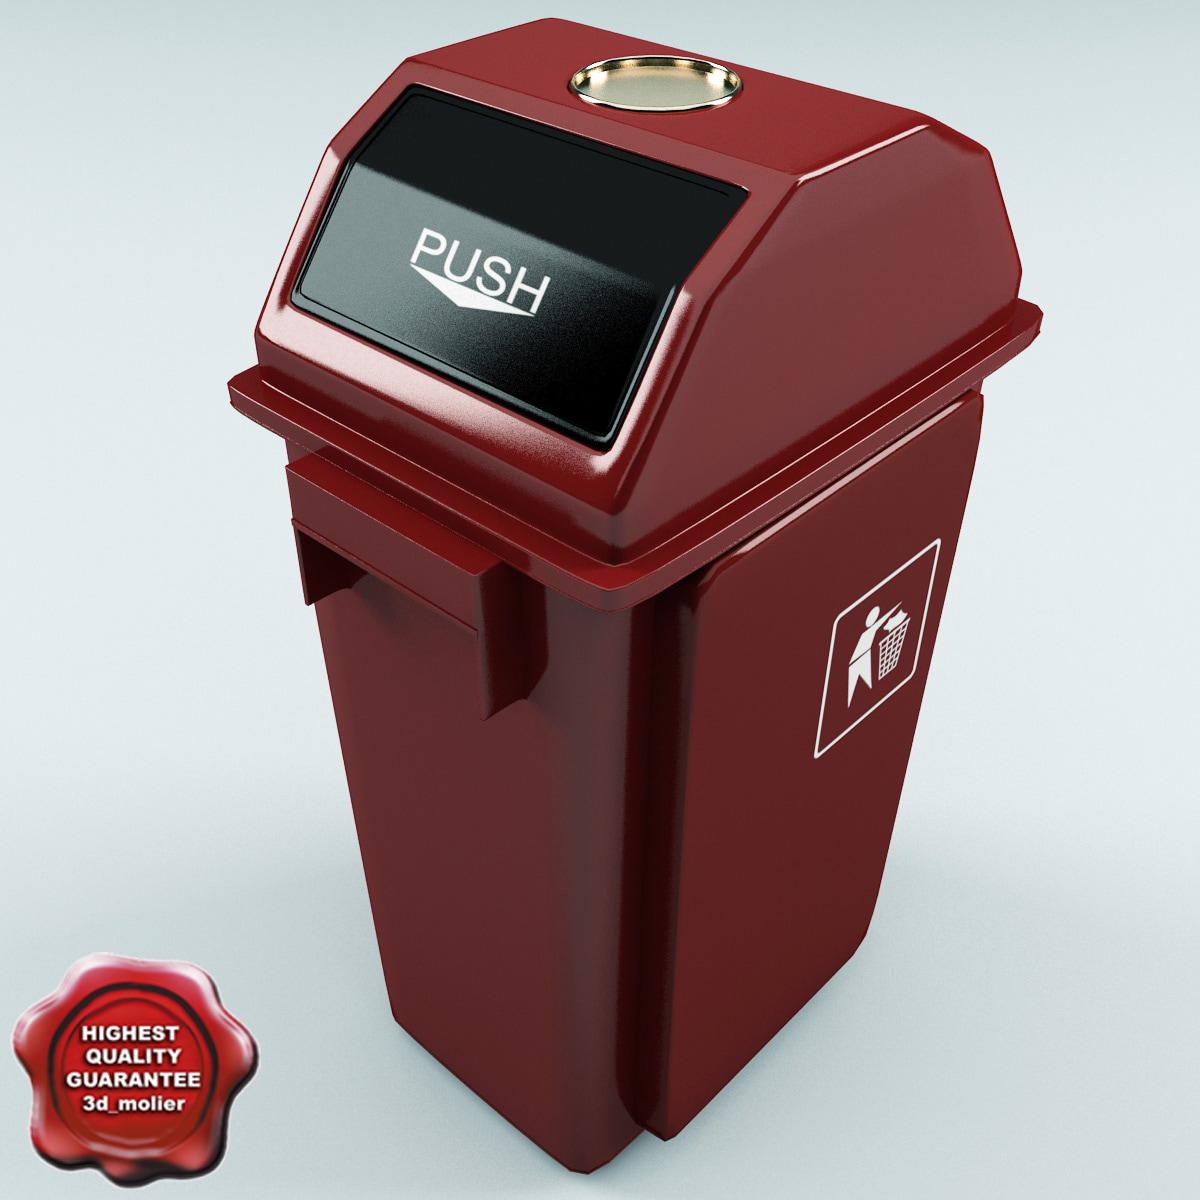 Trash_Can_Red_Plastic_0.jpg